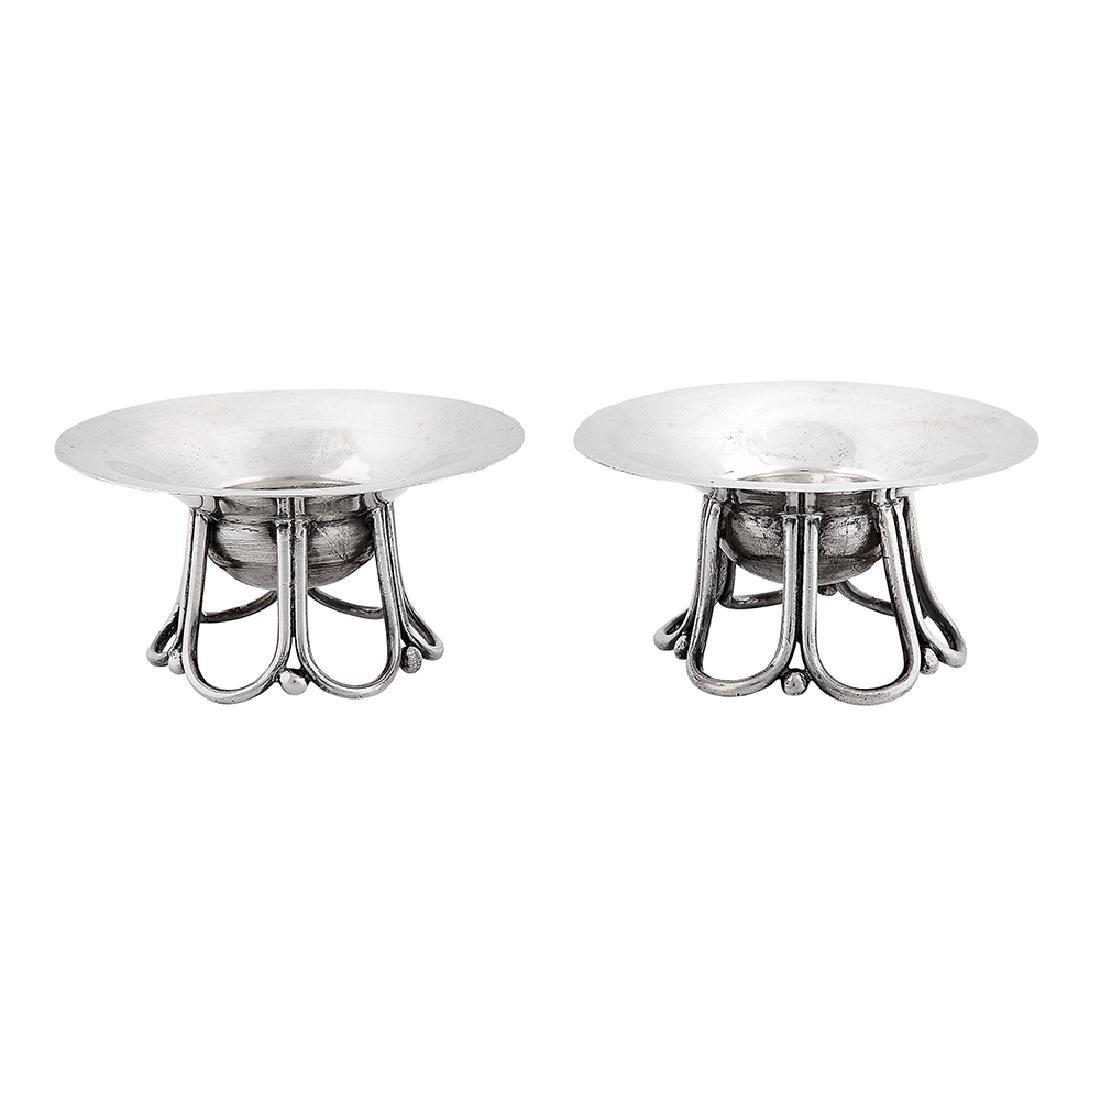 William Spratling (1900-1967) small bowls, pair - 2